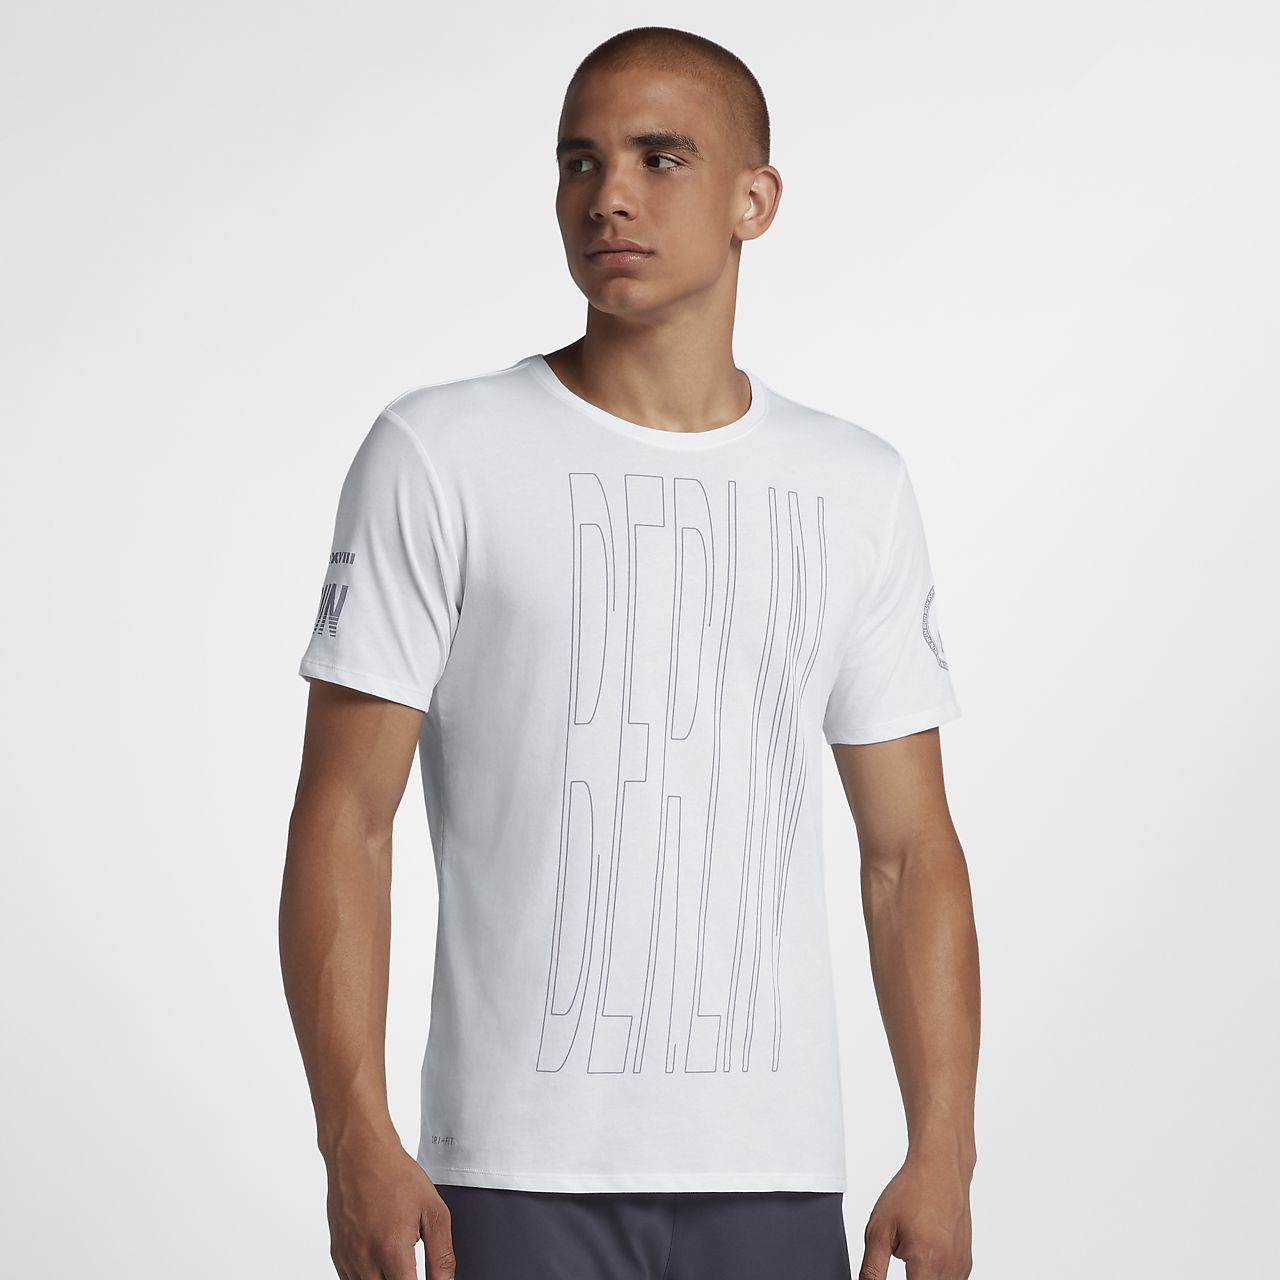 Nike Dri-FIT (Berlin 2018) Hardloopshirt voor heren